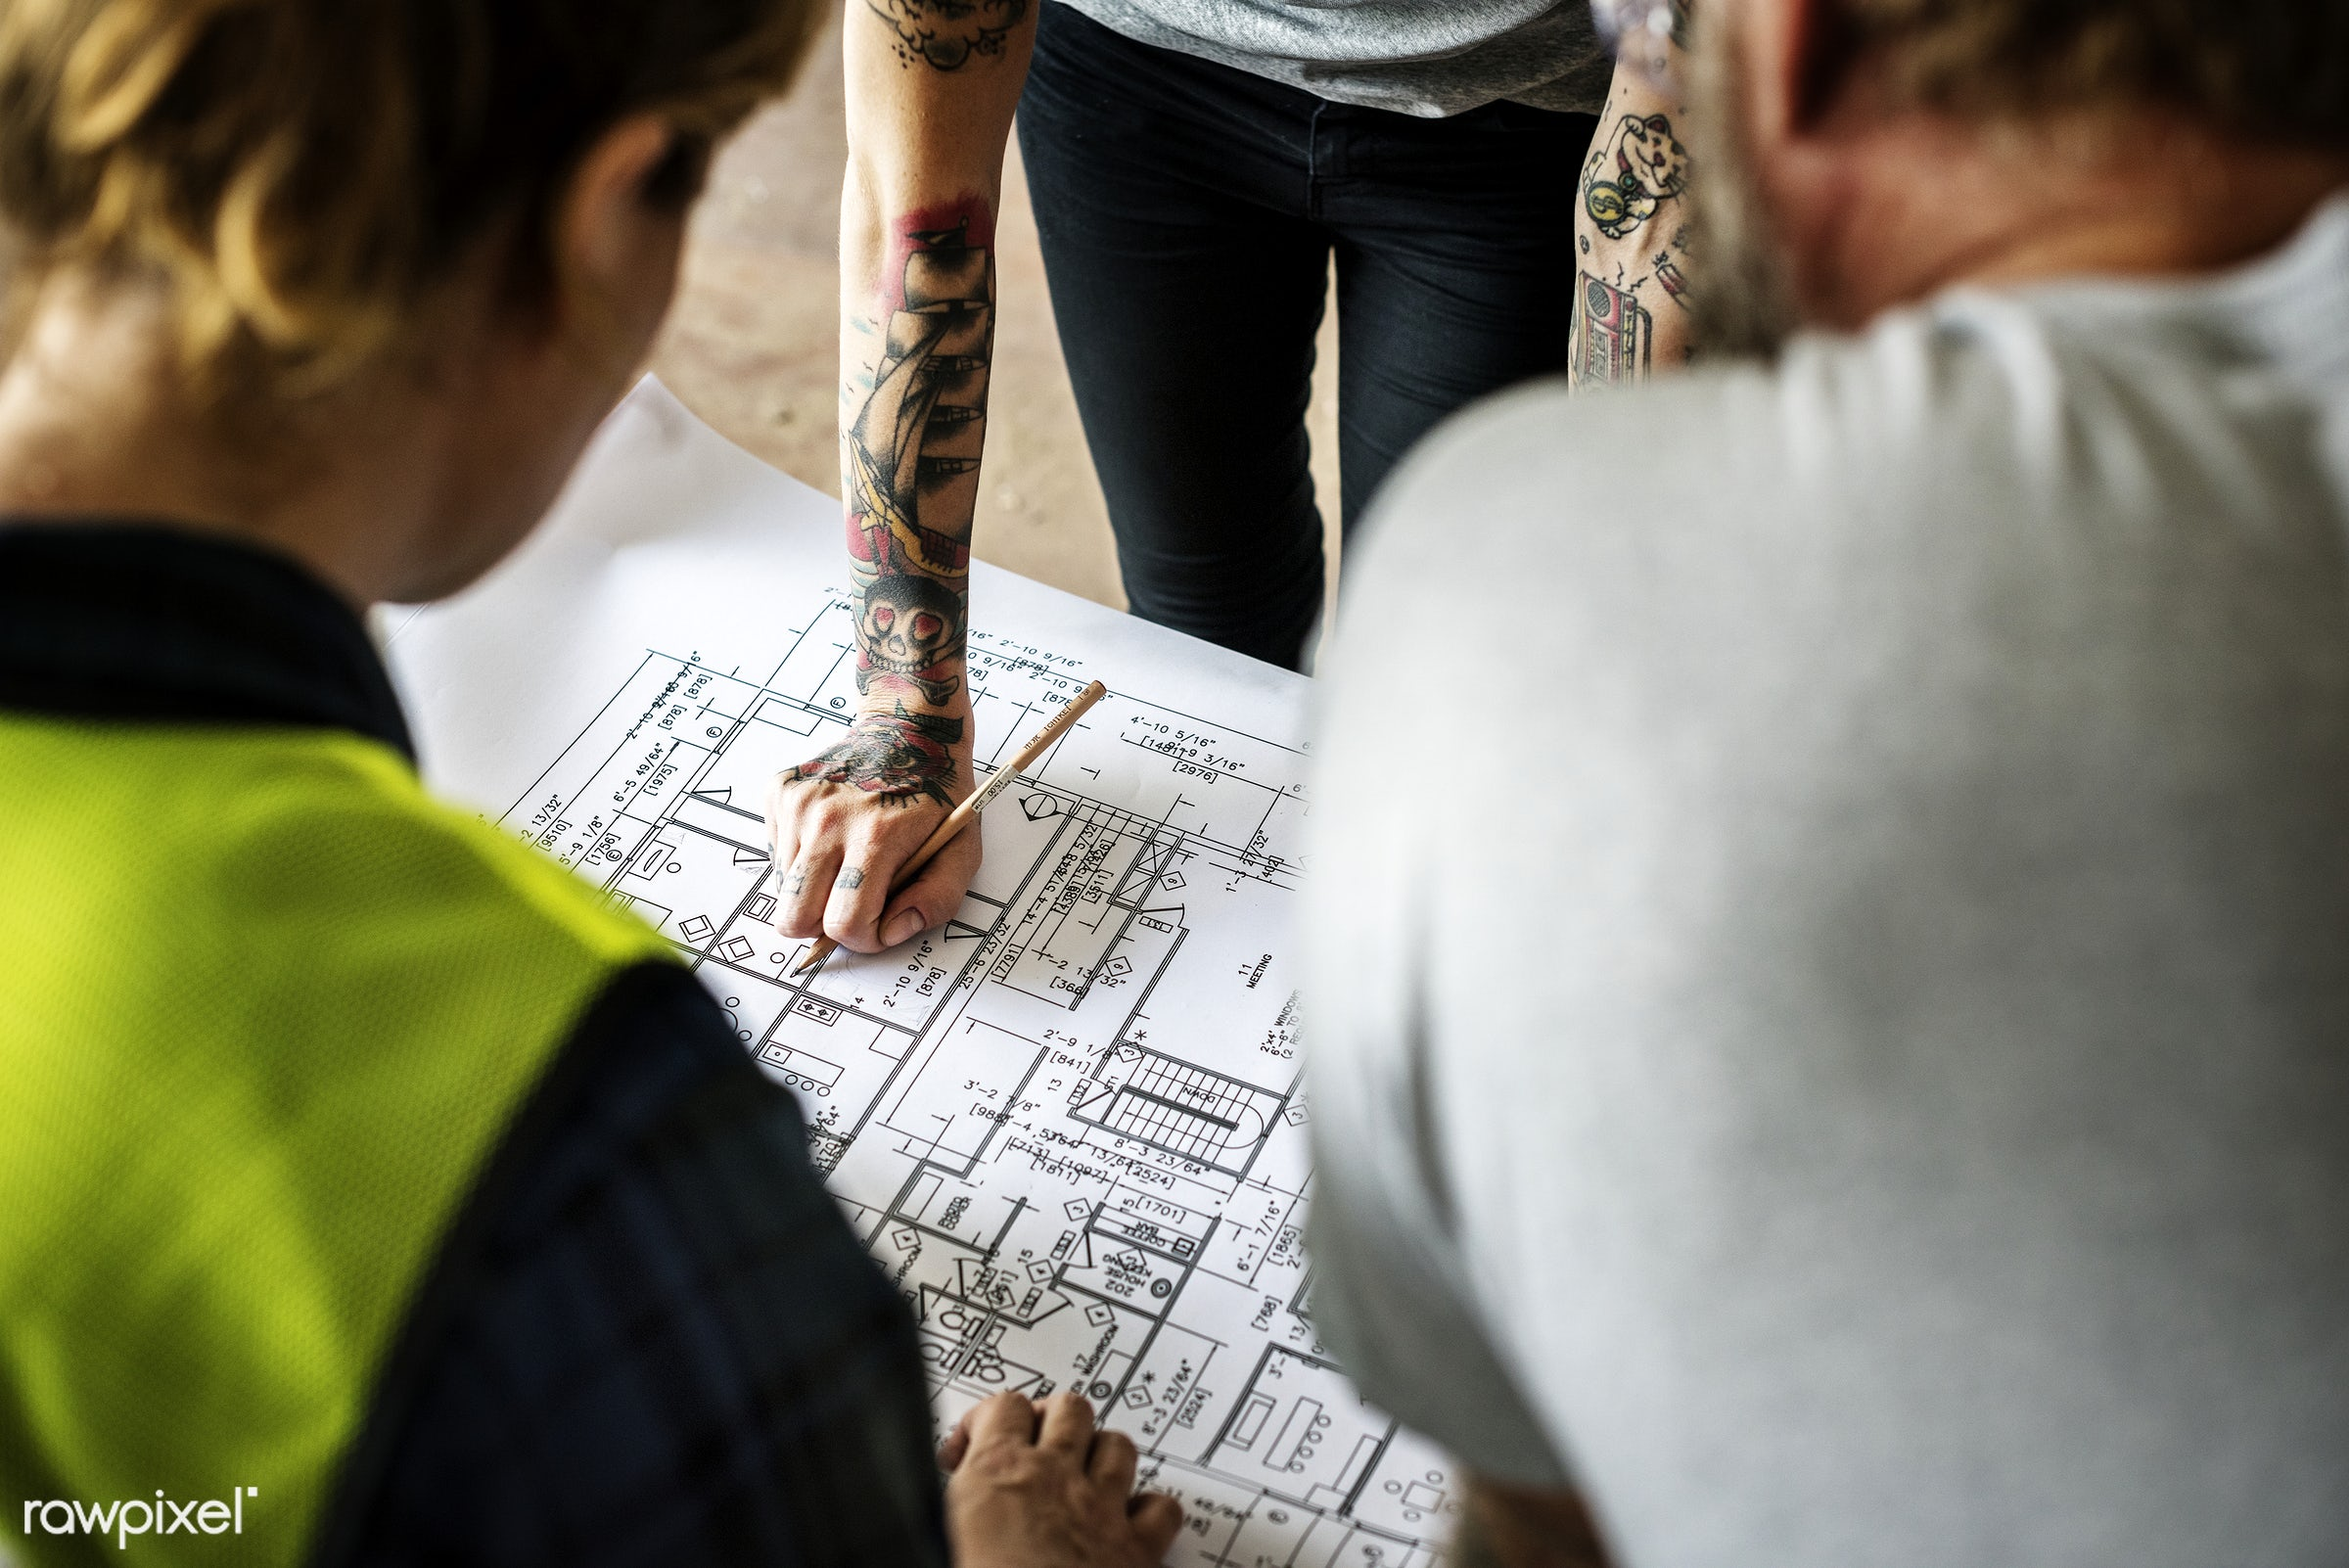 Construction team working on a blueprint for a new project - architect, architectural, architecture, blueprint, build,...